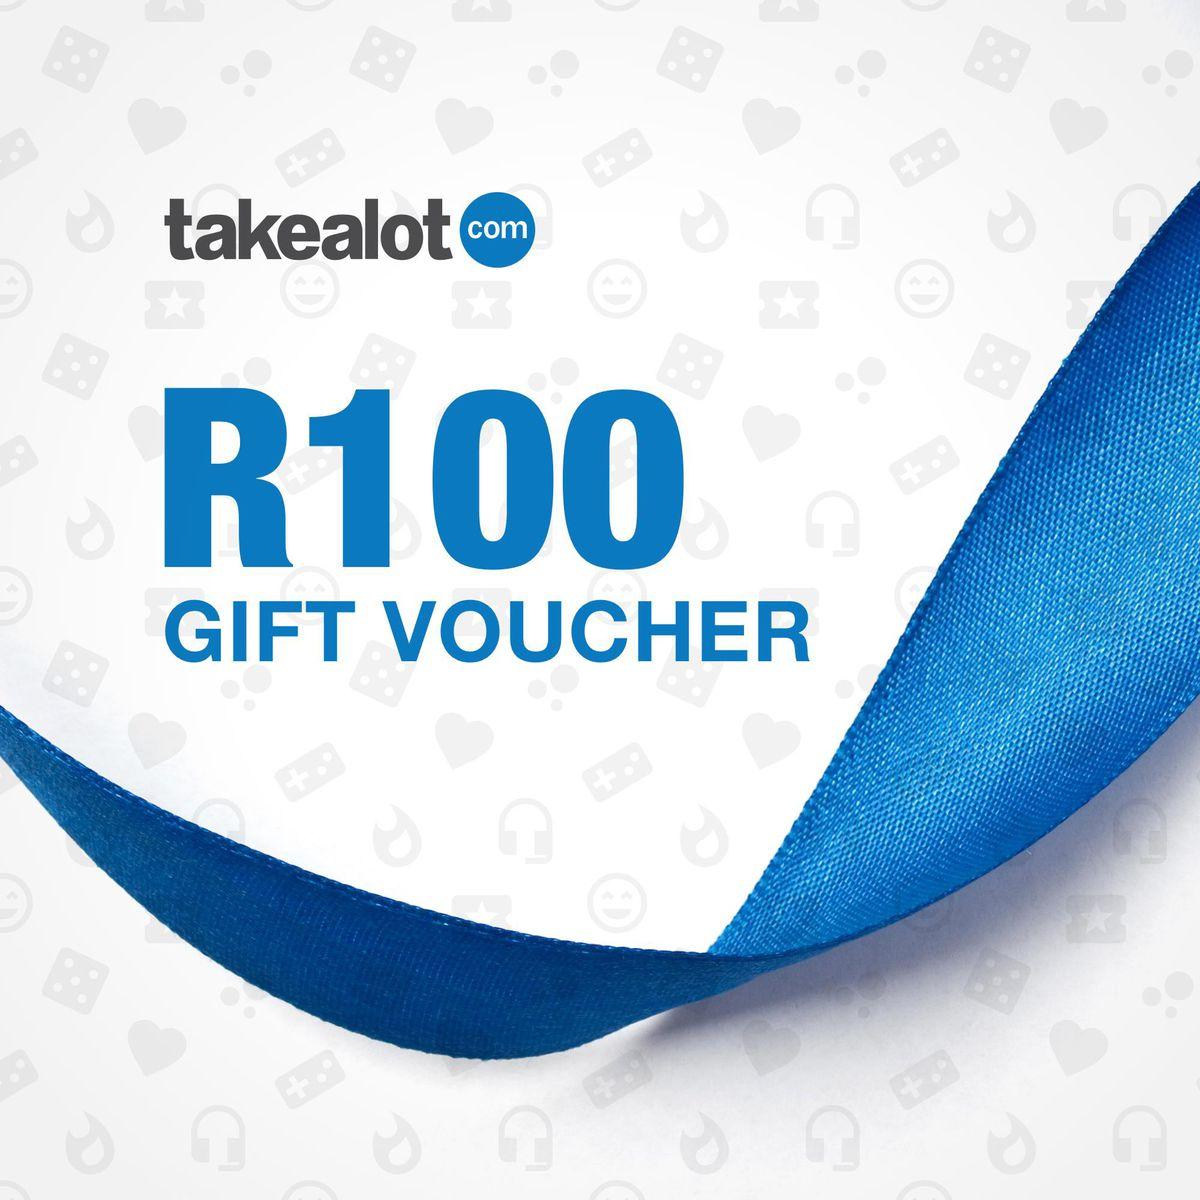 takealot gift voucher